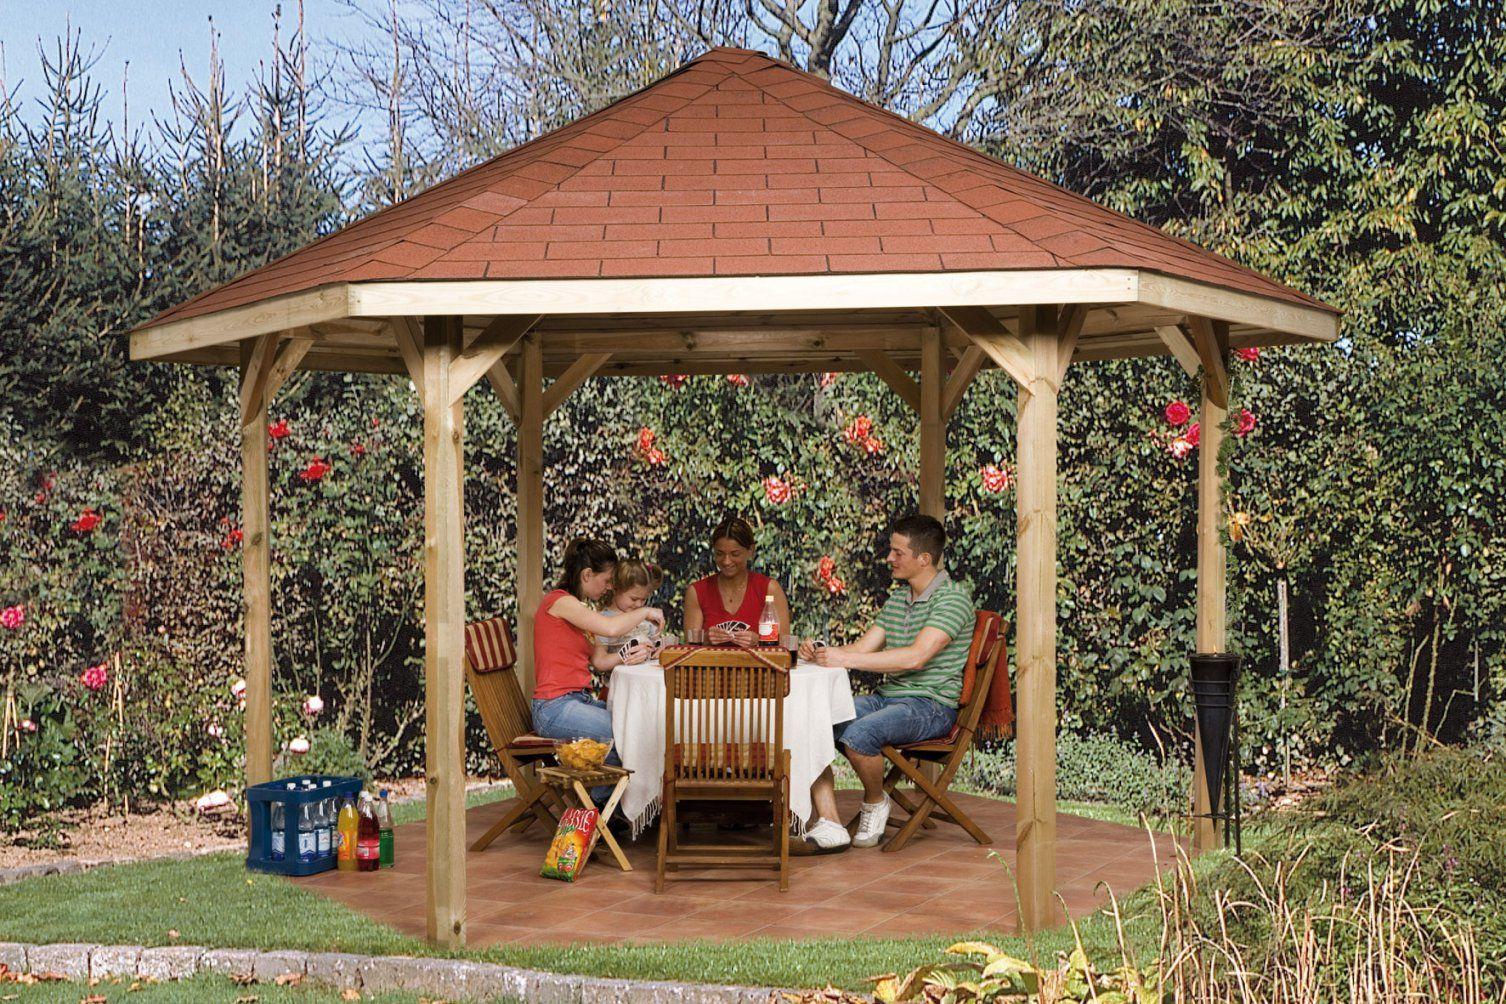 Weka Gartenlaube 656 Gr2 Pavillon Kdi 399X461Cm  Bei Edingershops von Holz Pavillon 6 Eckig Photo